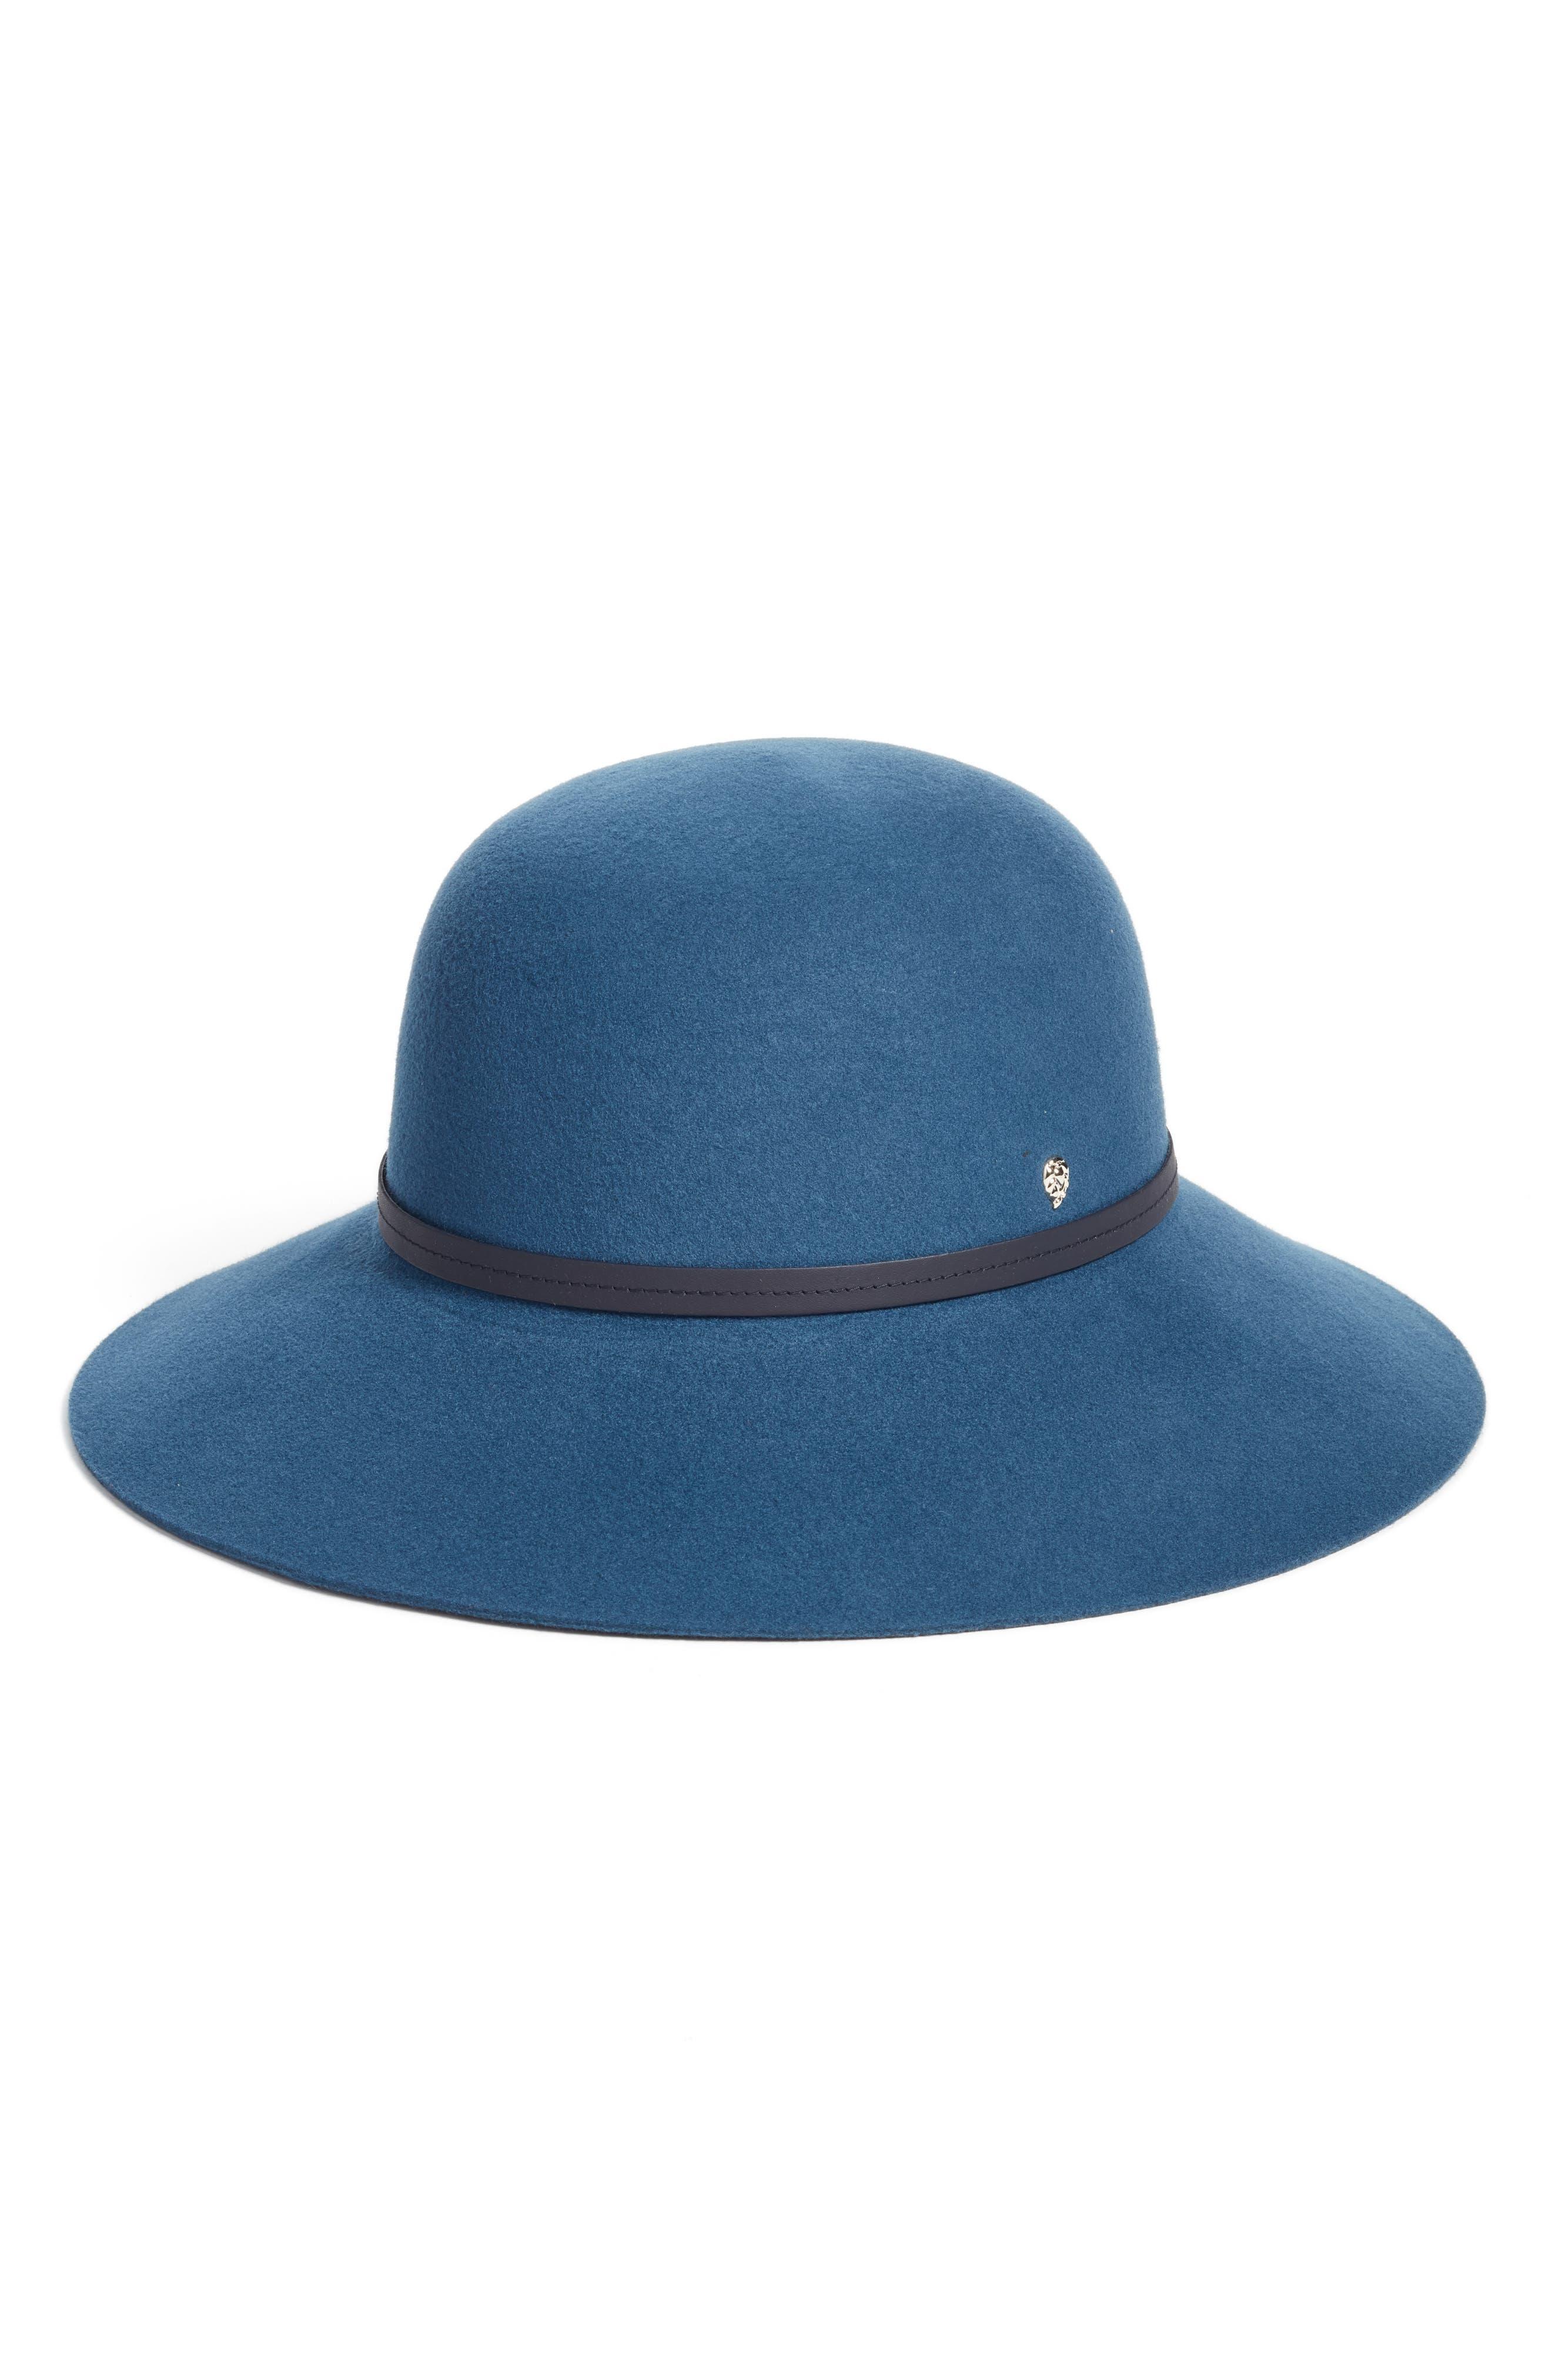 Angled Brim Wool Felt Hat,                             Main thumbnail 1, color,                             Smoke Blue/ Navy